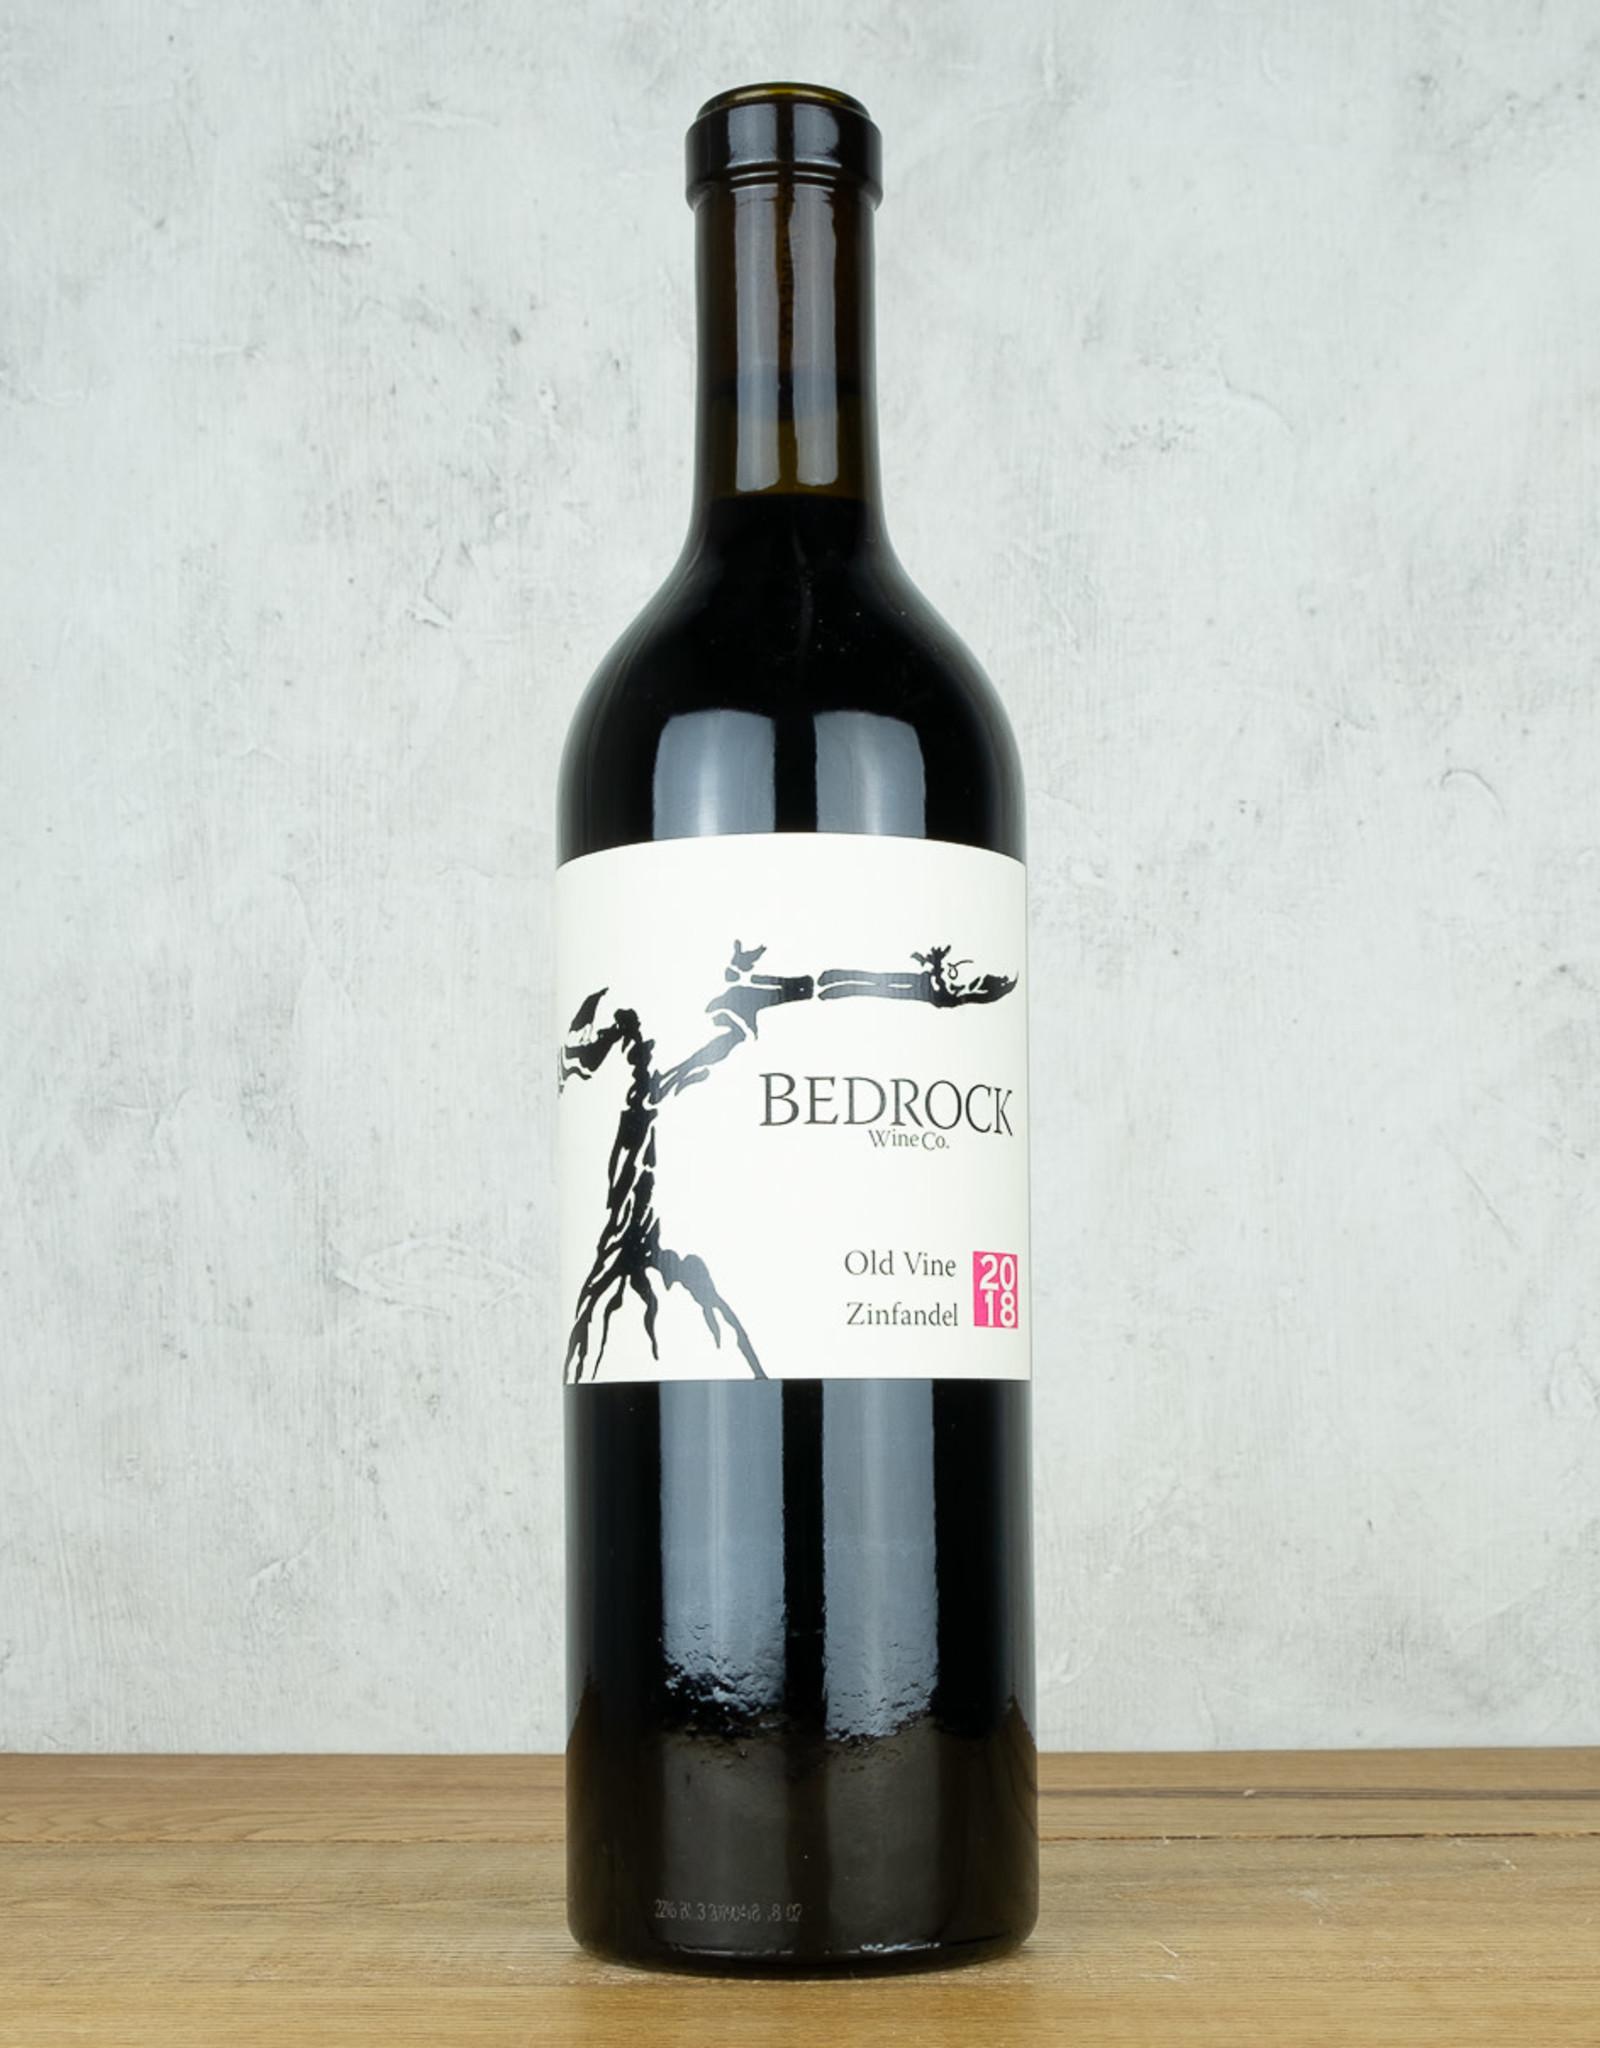 Bedrock Wine Co. Old Vine Zinfandel